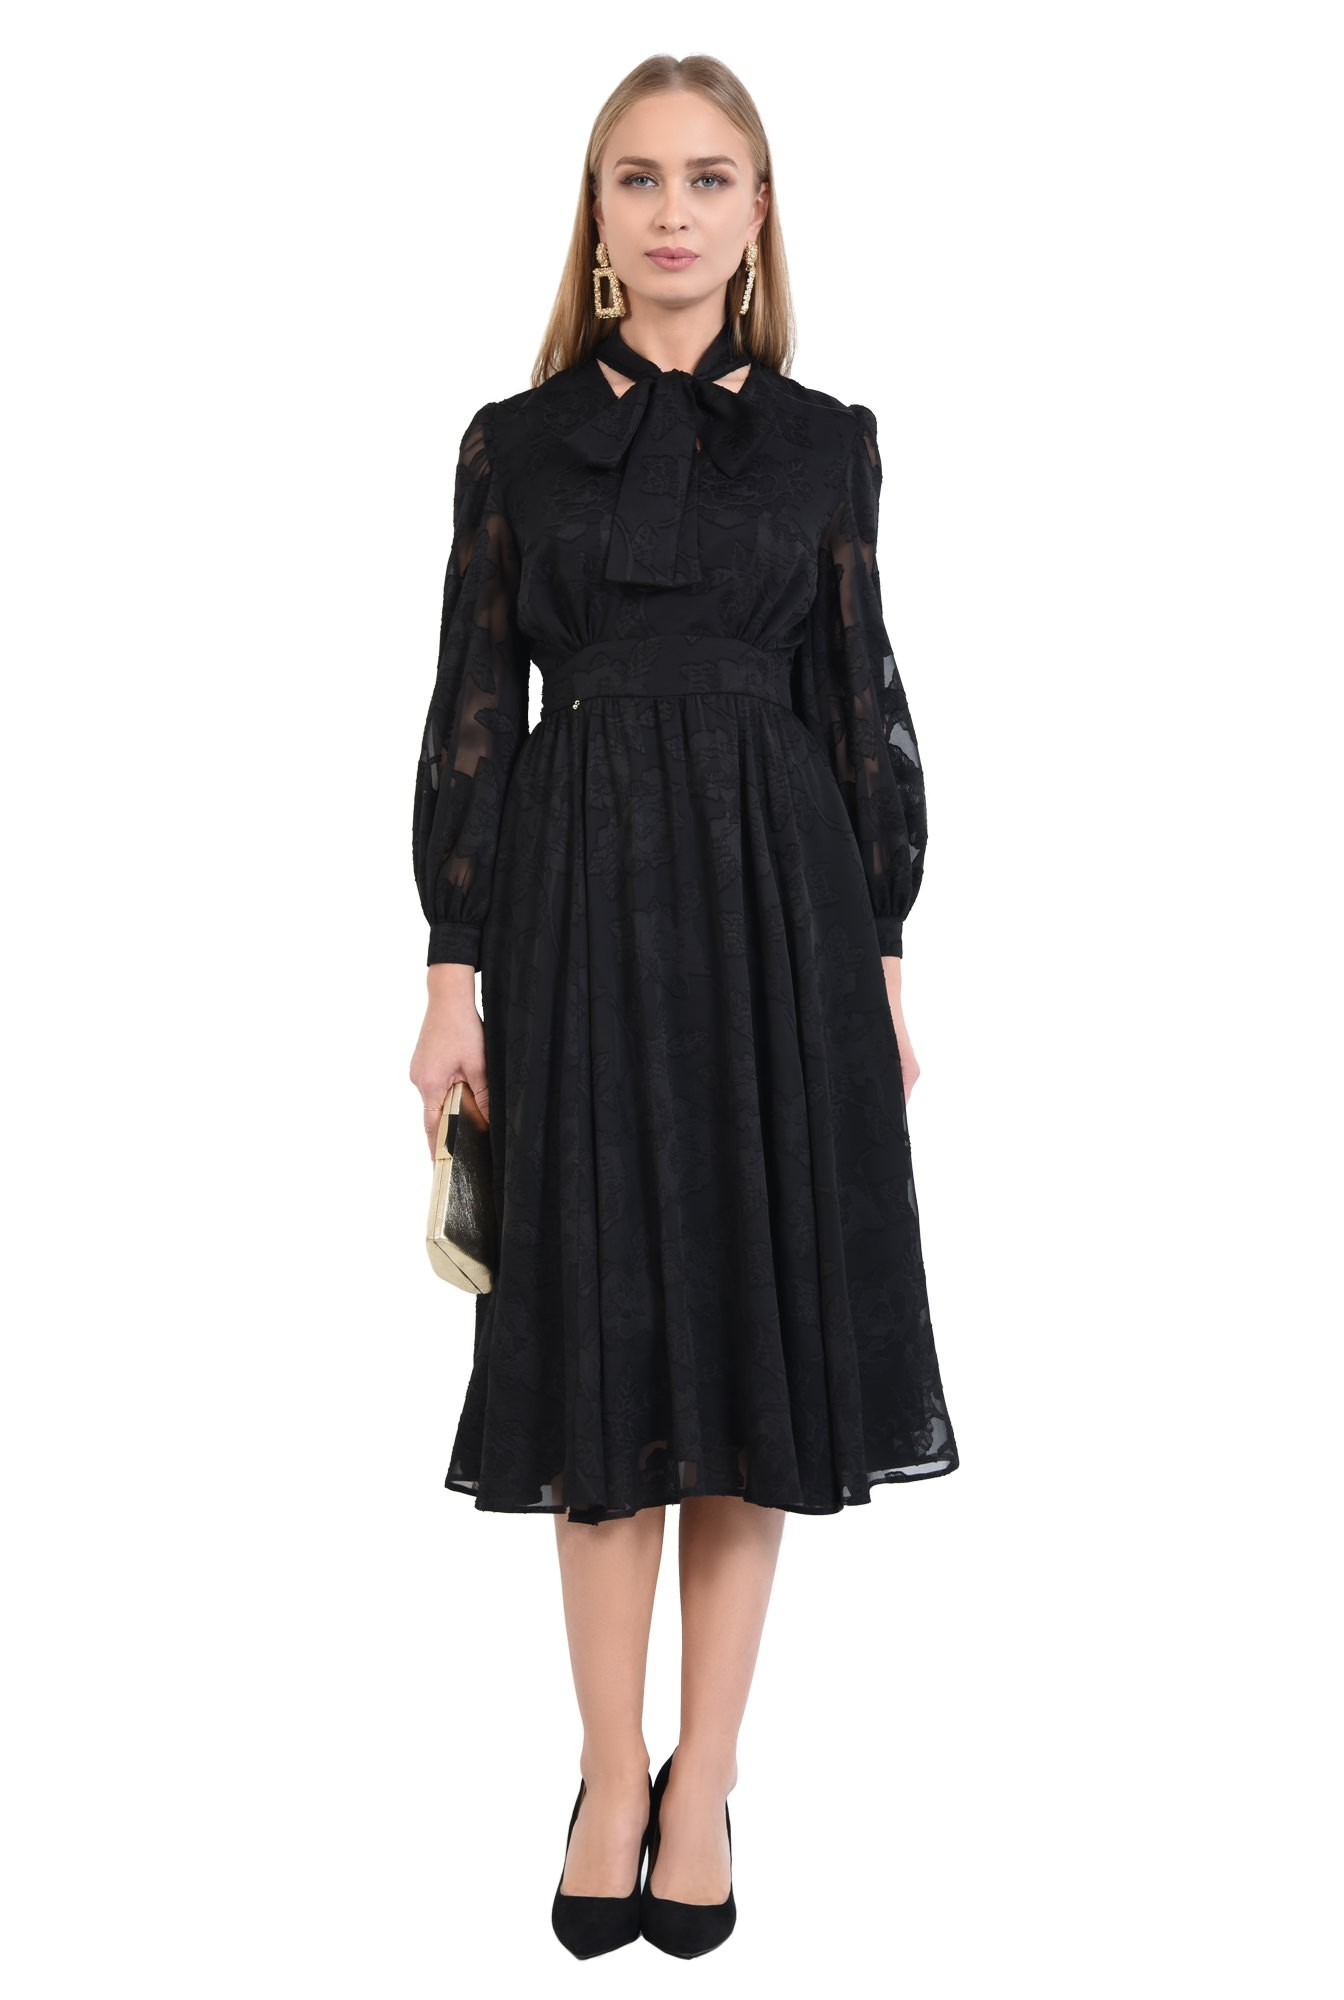 3 - 360 - rochie eleganta, clos, neagra, funda la gat, maneci transparente